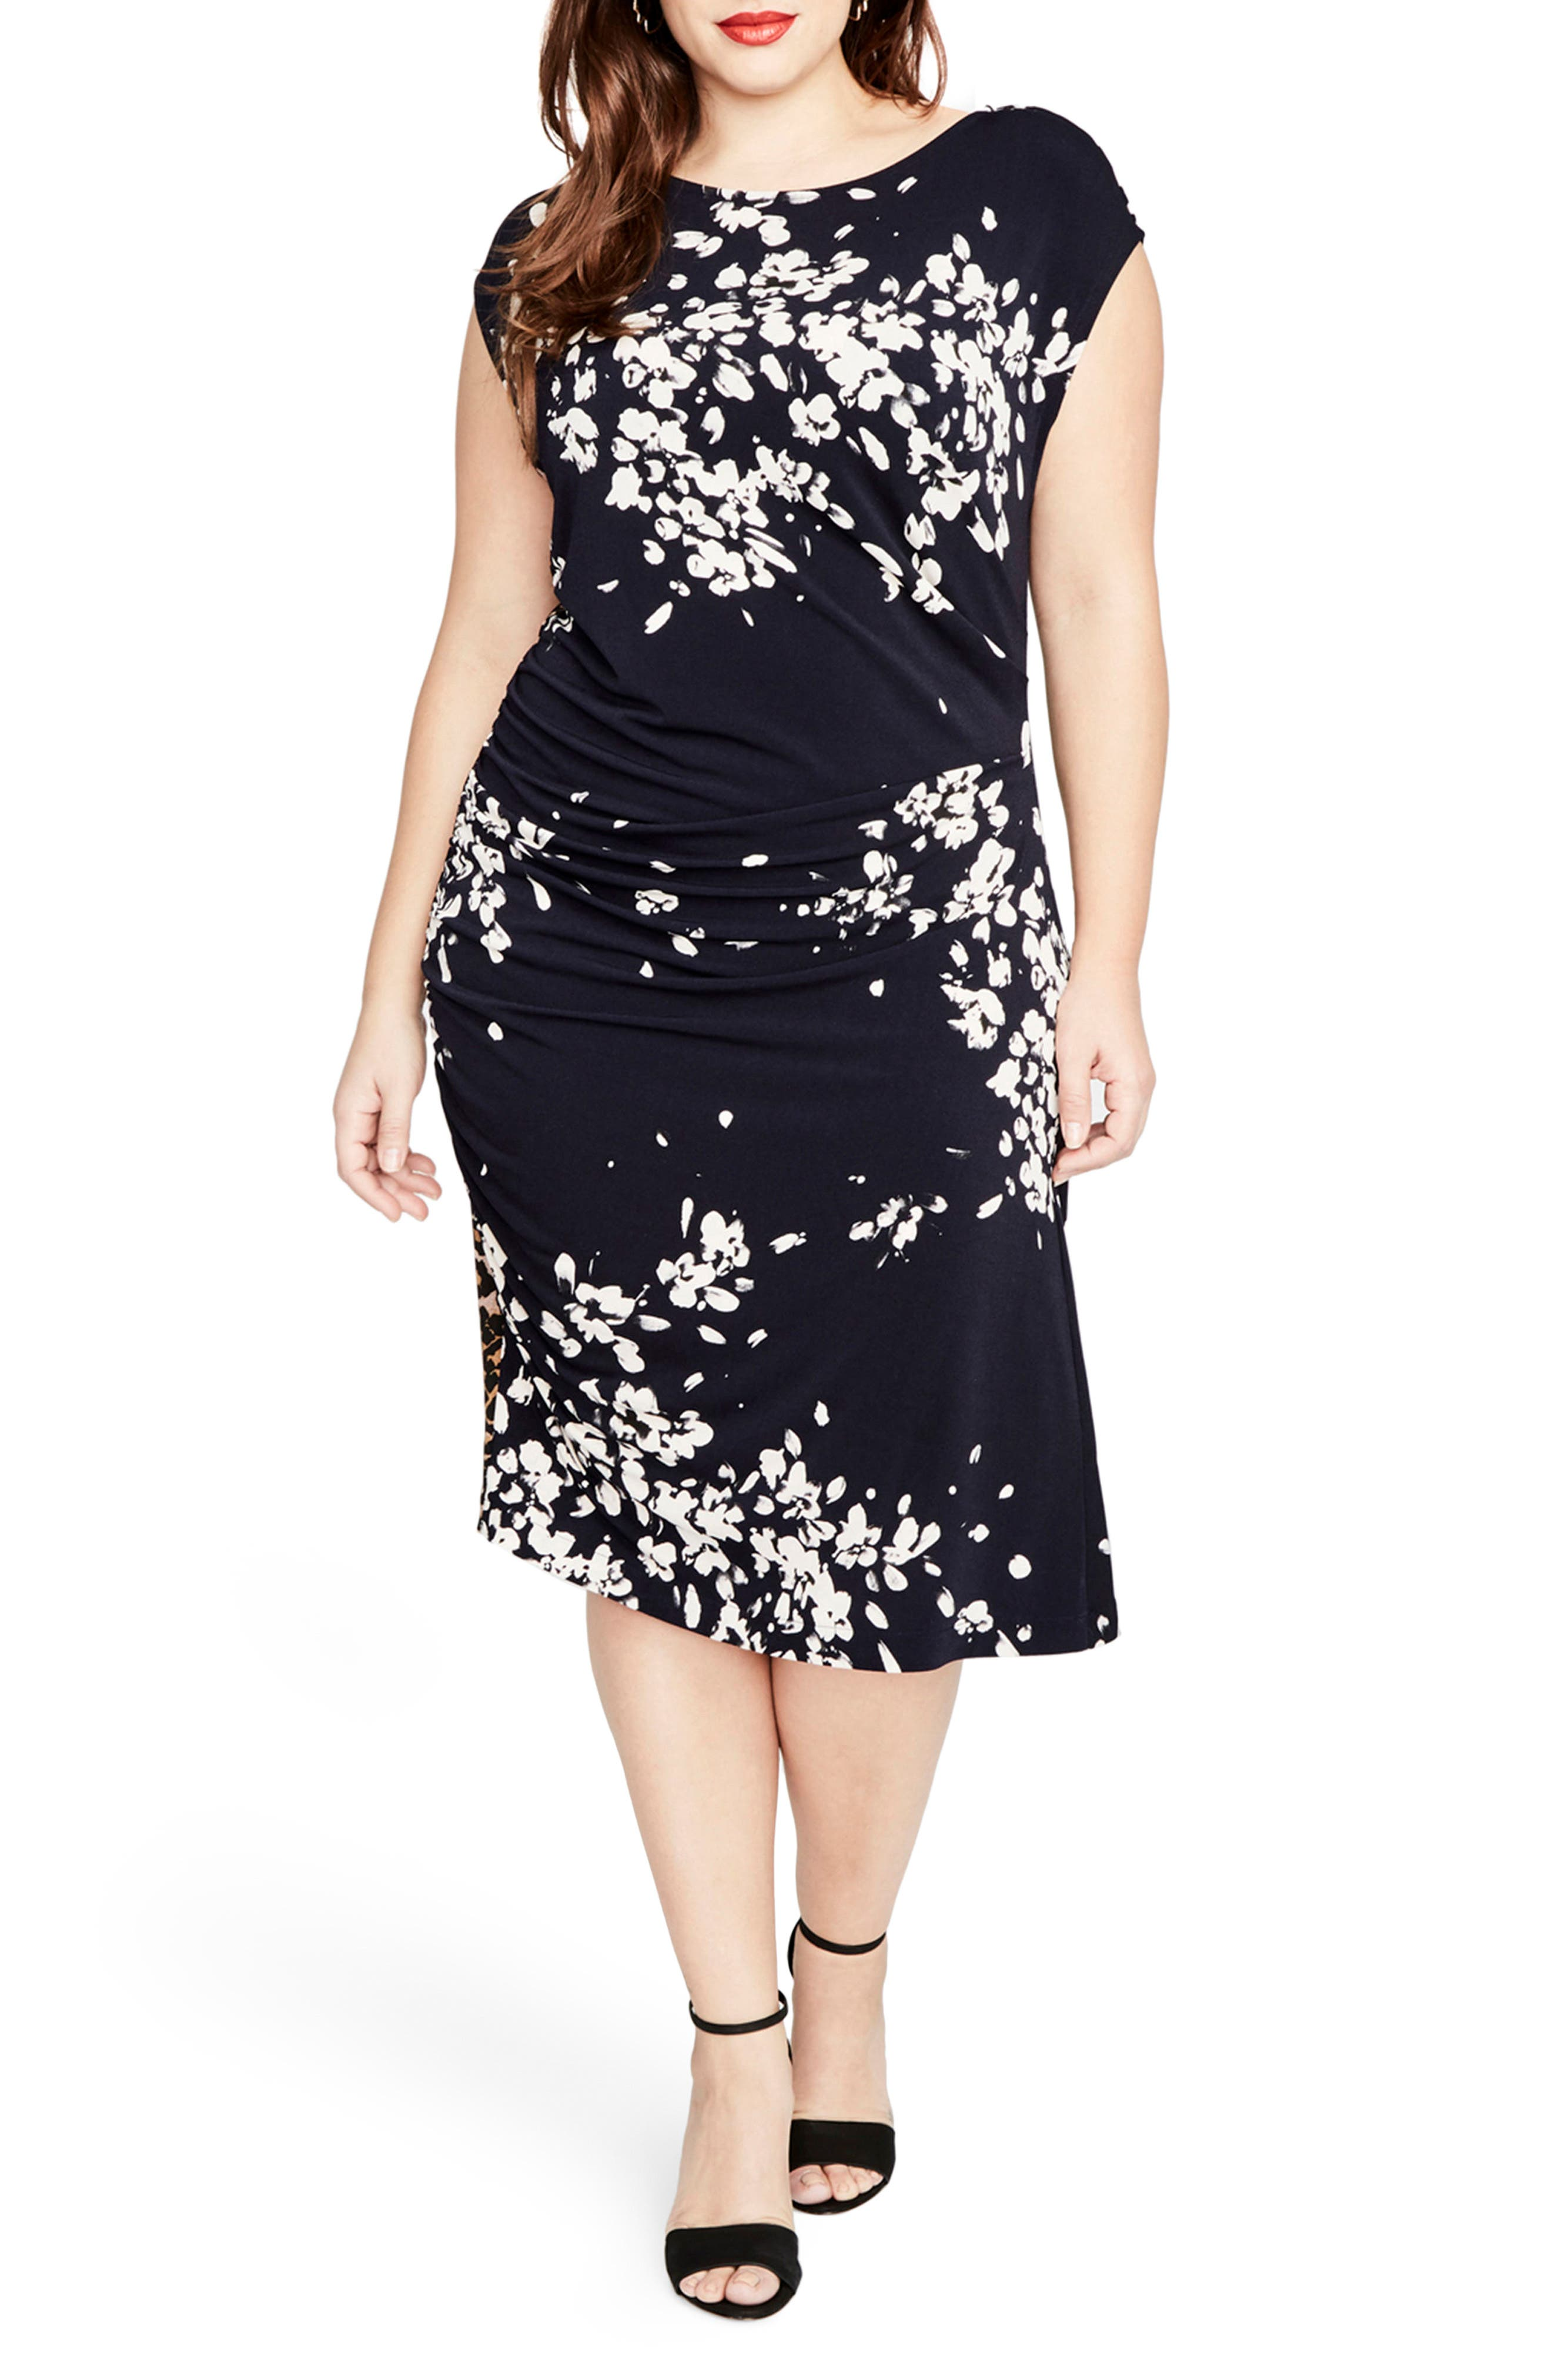 RACHEL BY Rachel Roy Asymmetrical Floral Dress,                             Main thumbnail 1, color,                             Navy Combo